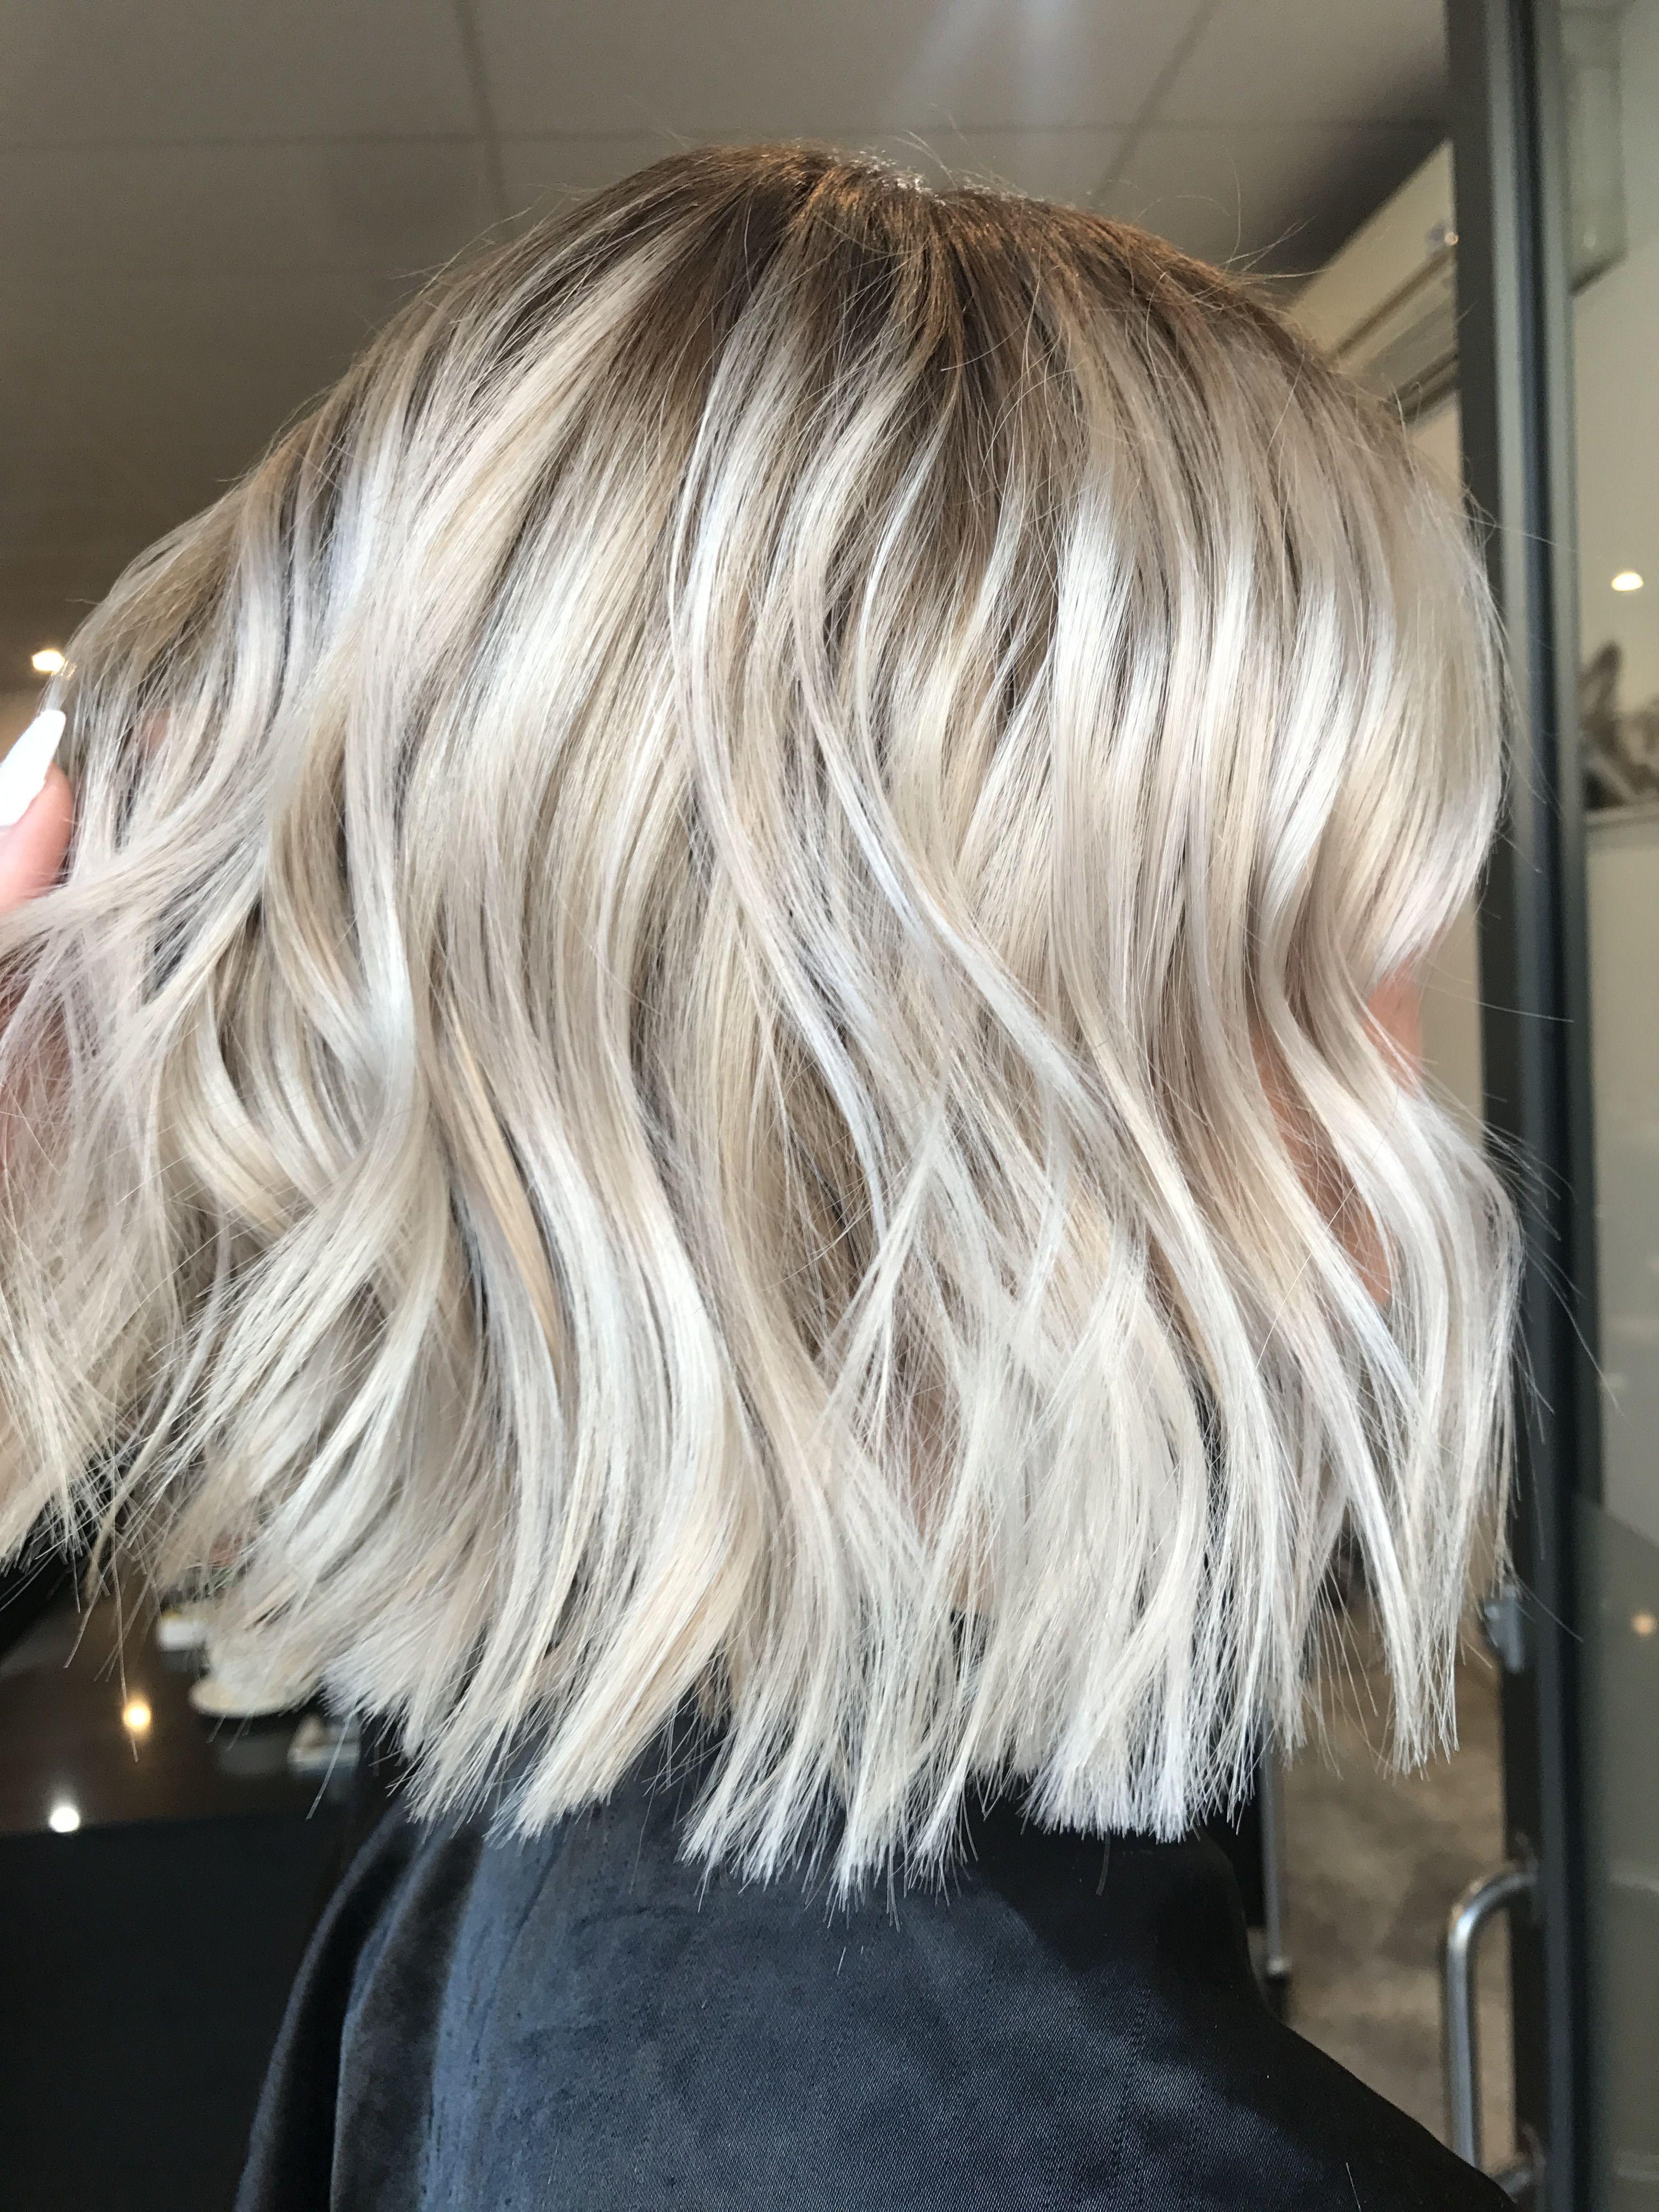 Blonde Balayage Long Hair Cool Girl Hair Lived In Hair Colour Blonde Bronde Brunette Golden Tones Balayage Hair Blonde Long Hair Styles Balayage Long Hair